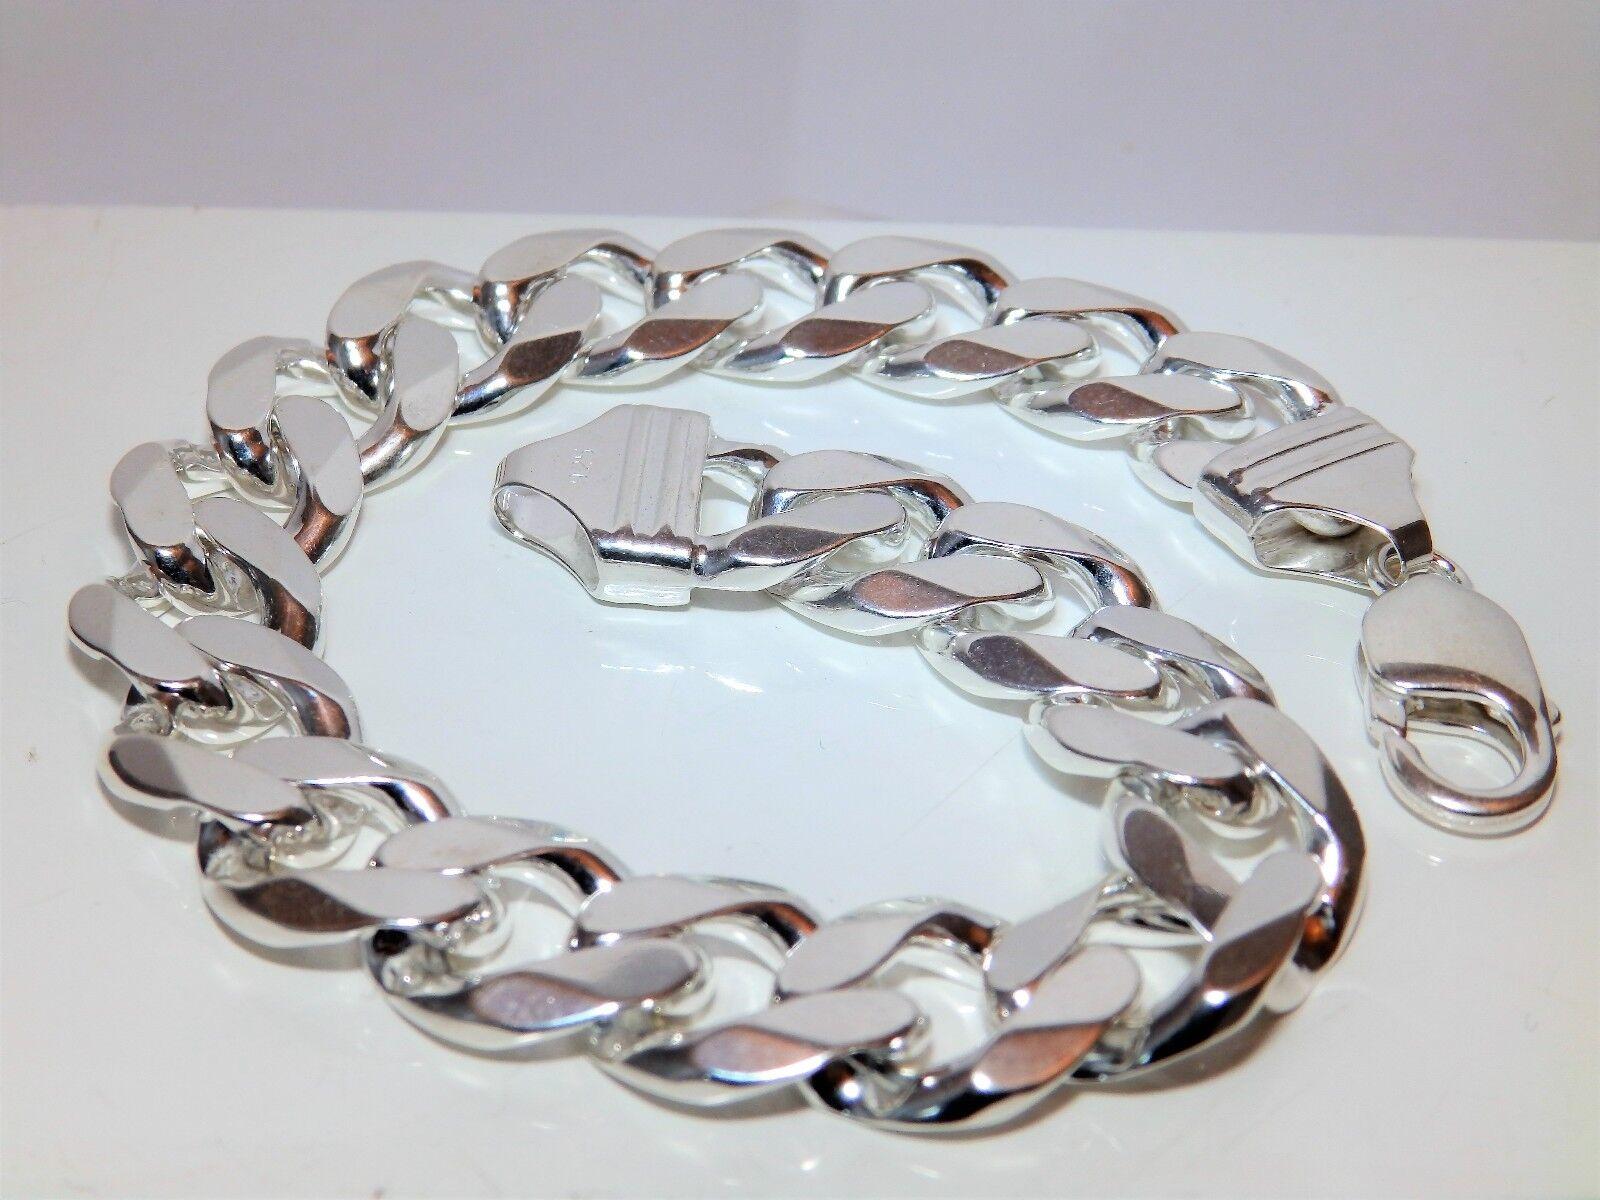 Gents 59.8g (2oz) argentoO 9 1 2    lunghi 13 mm di larghezza Cordolo LINK Braccialetto f96524